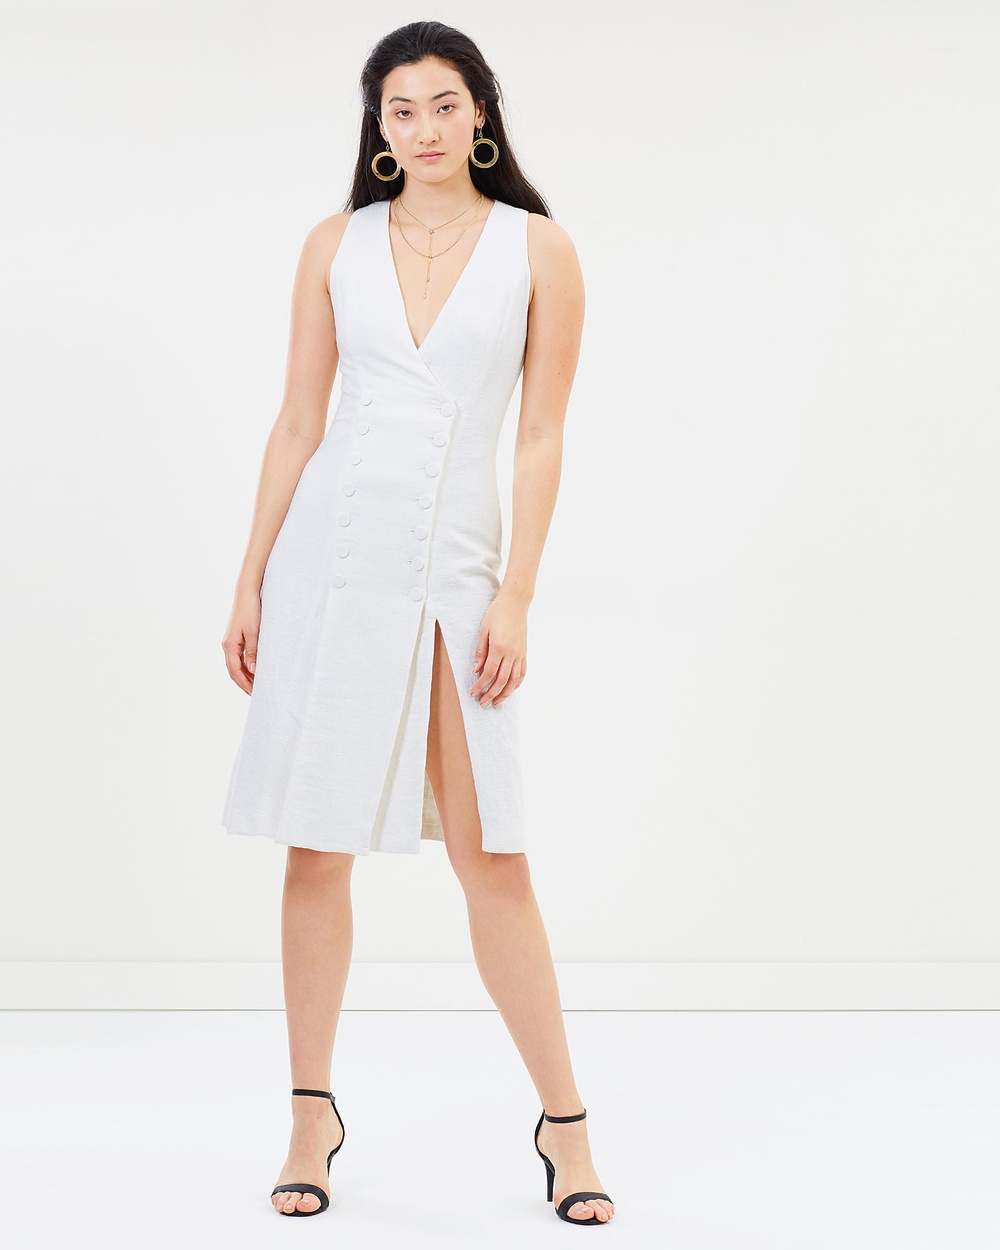 Third Form Closure Midi Dress Dresses Natural Closure Midi Dress